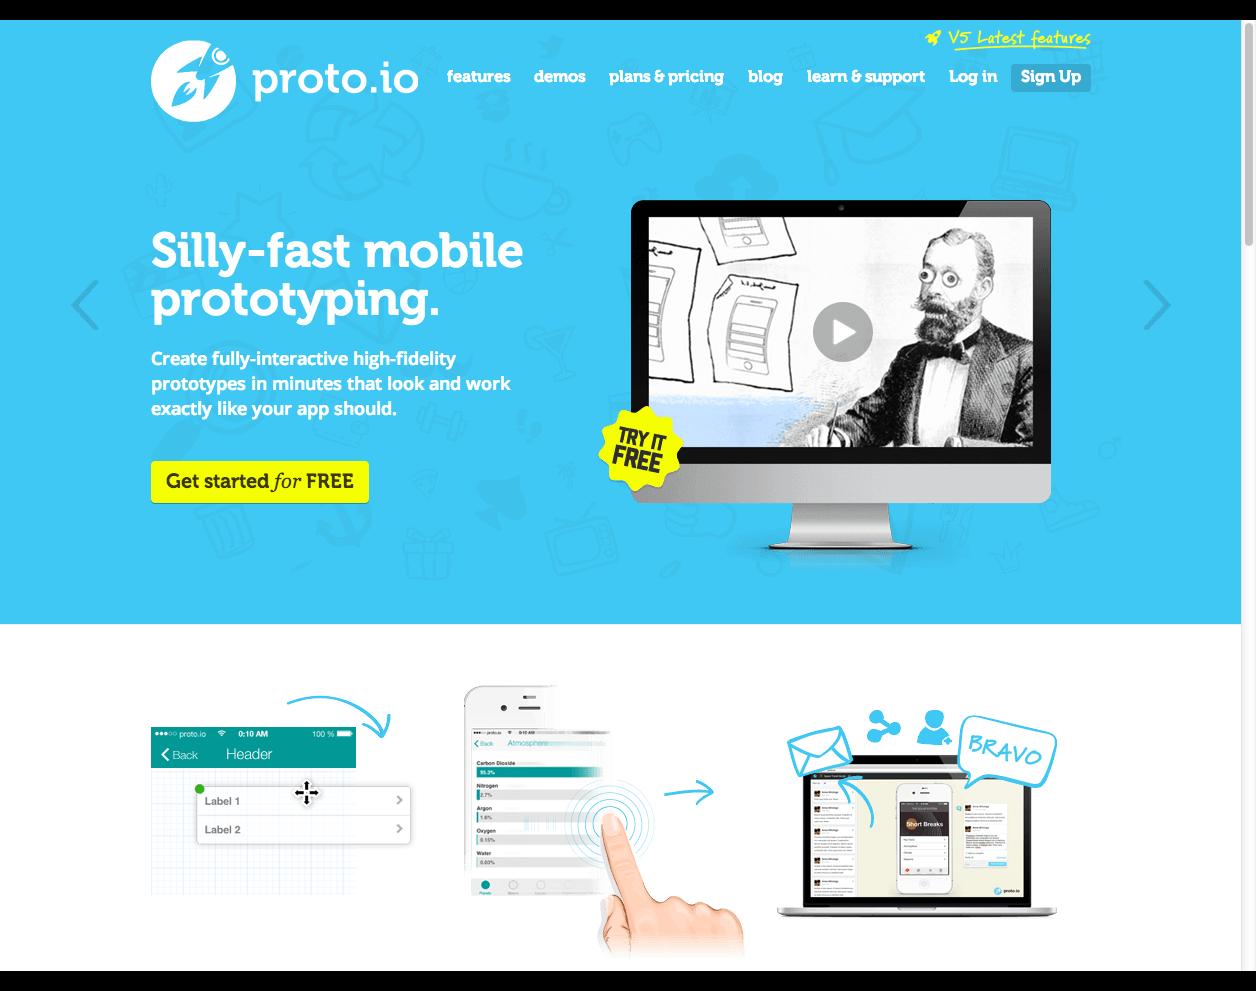 Proto.io - Silly-fast mobile prototyping.